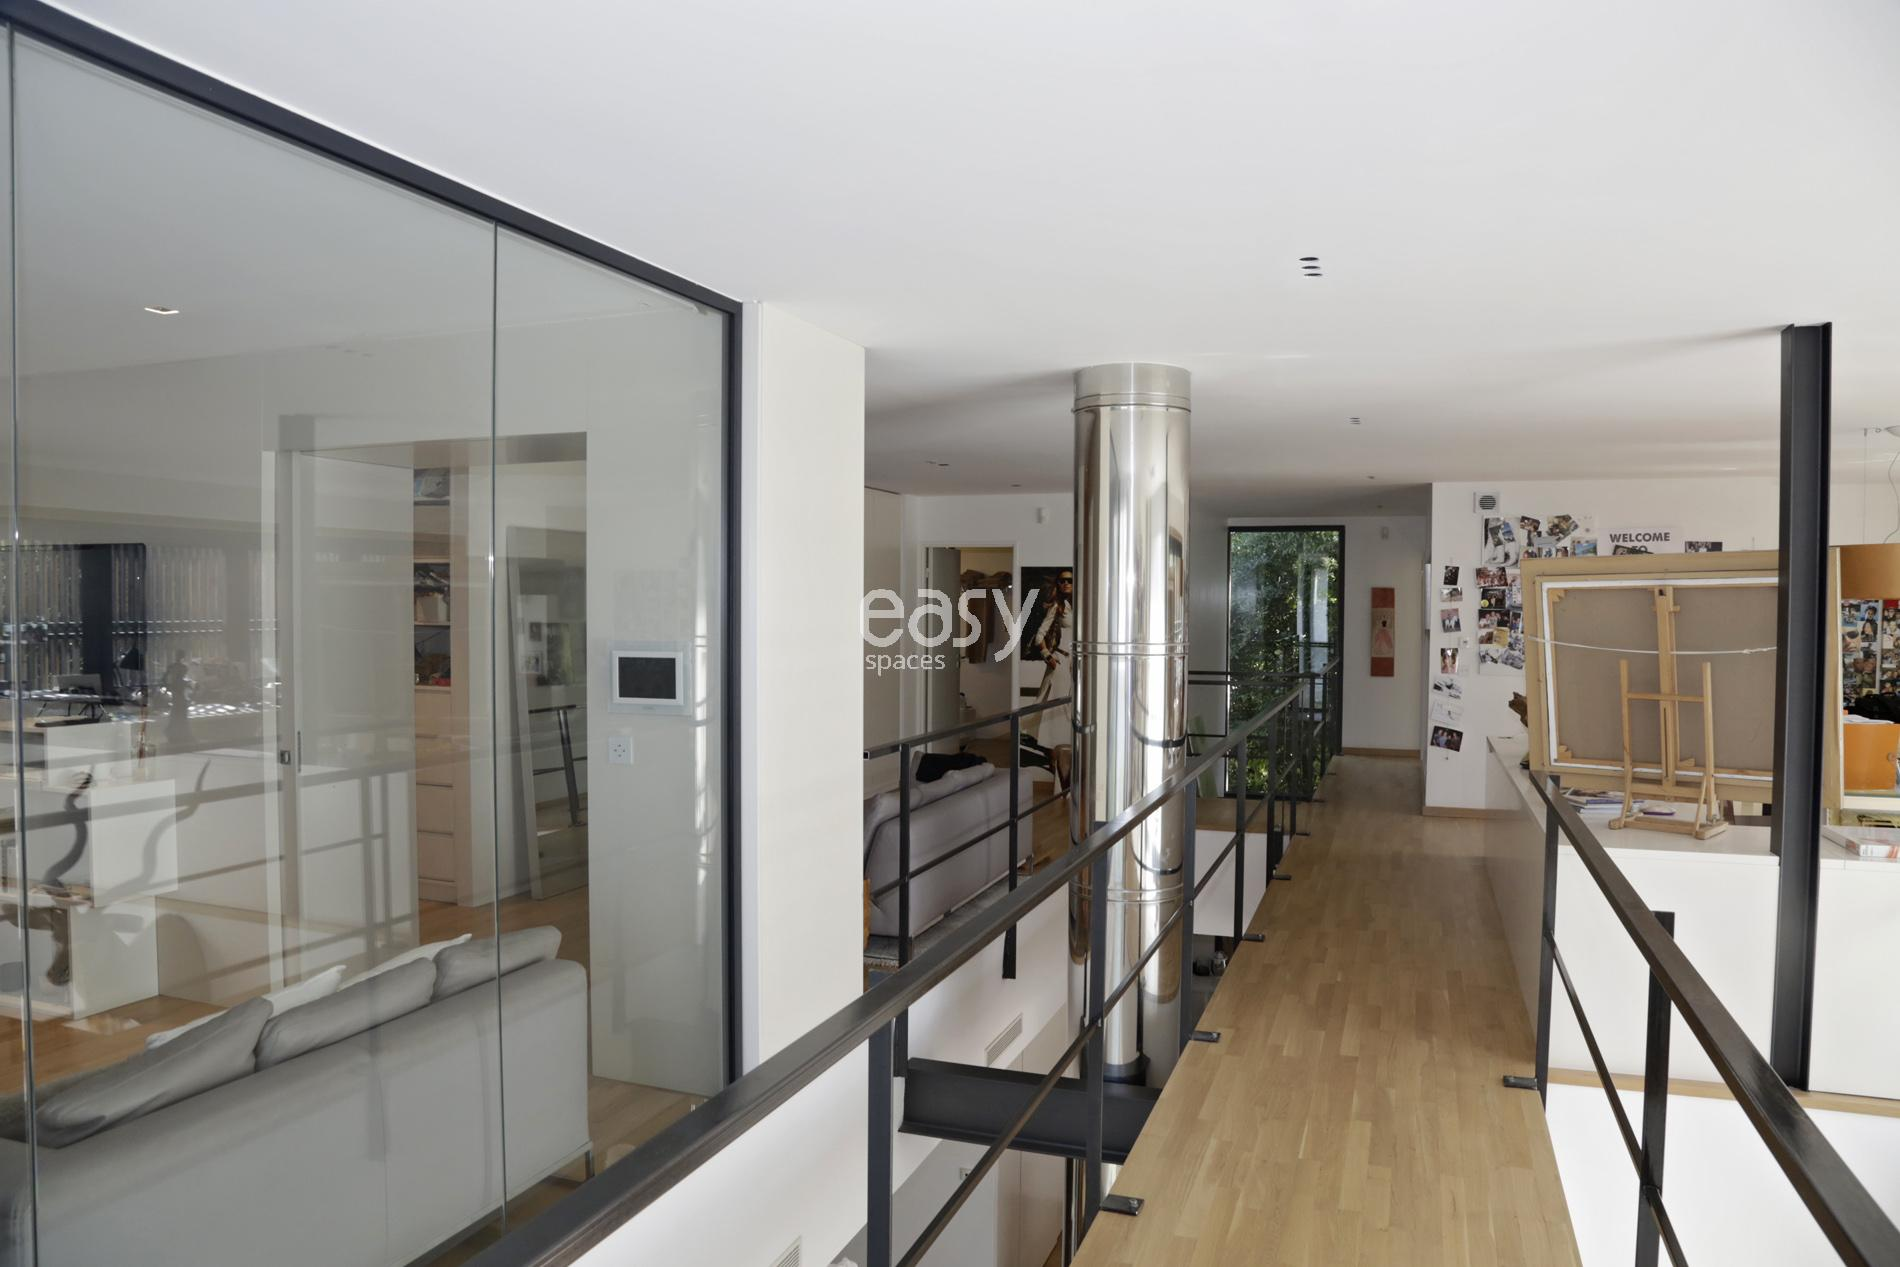 louer sa maison pour des tournages ventana blog. Black Bedroom Furniture Sets. Home Design Ideas